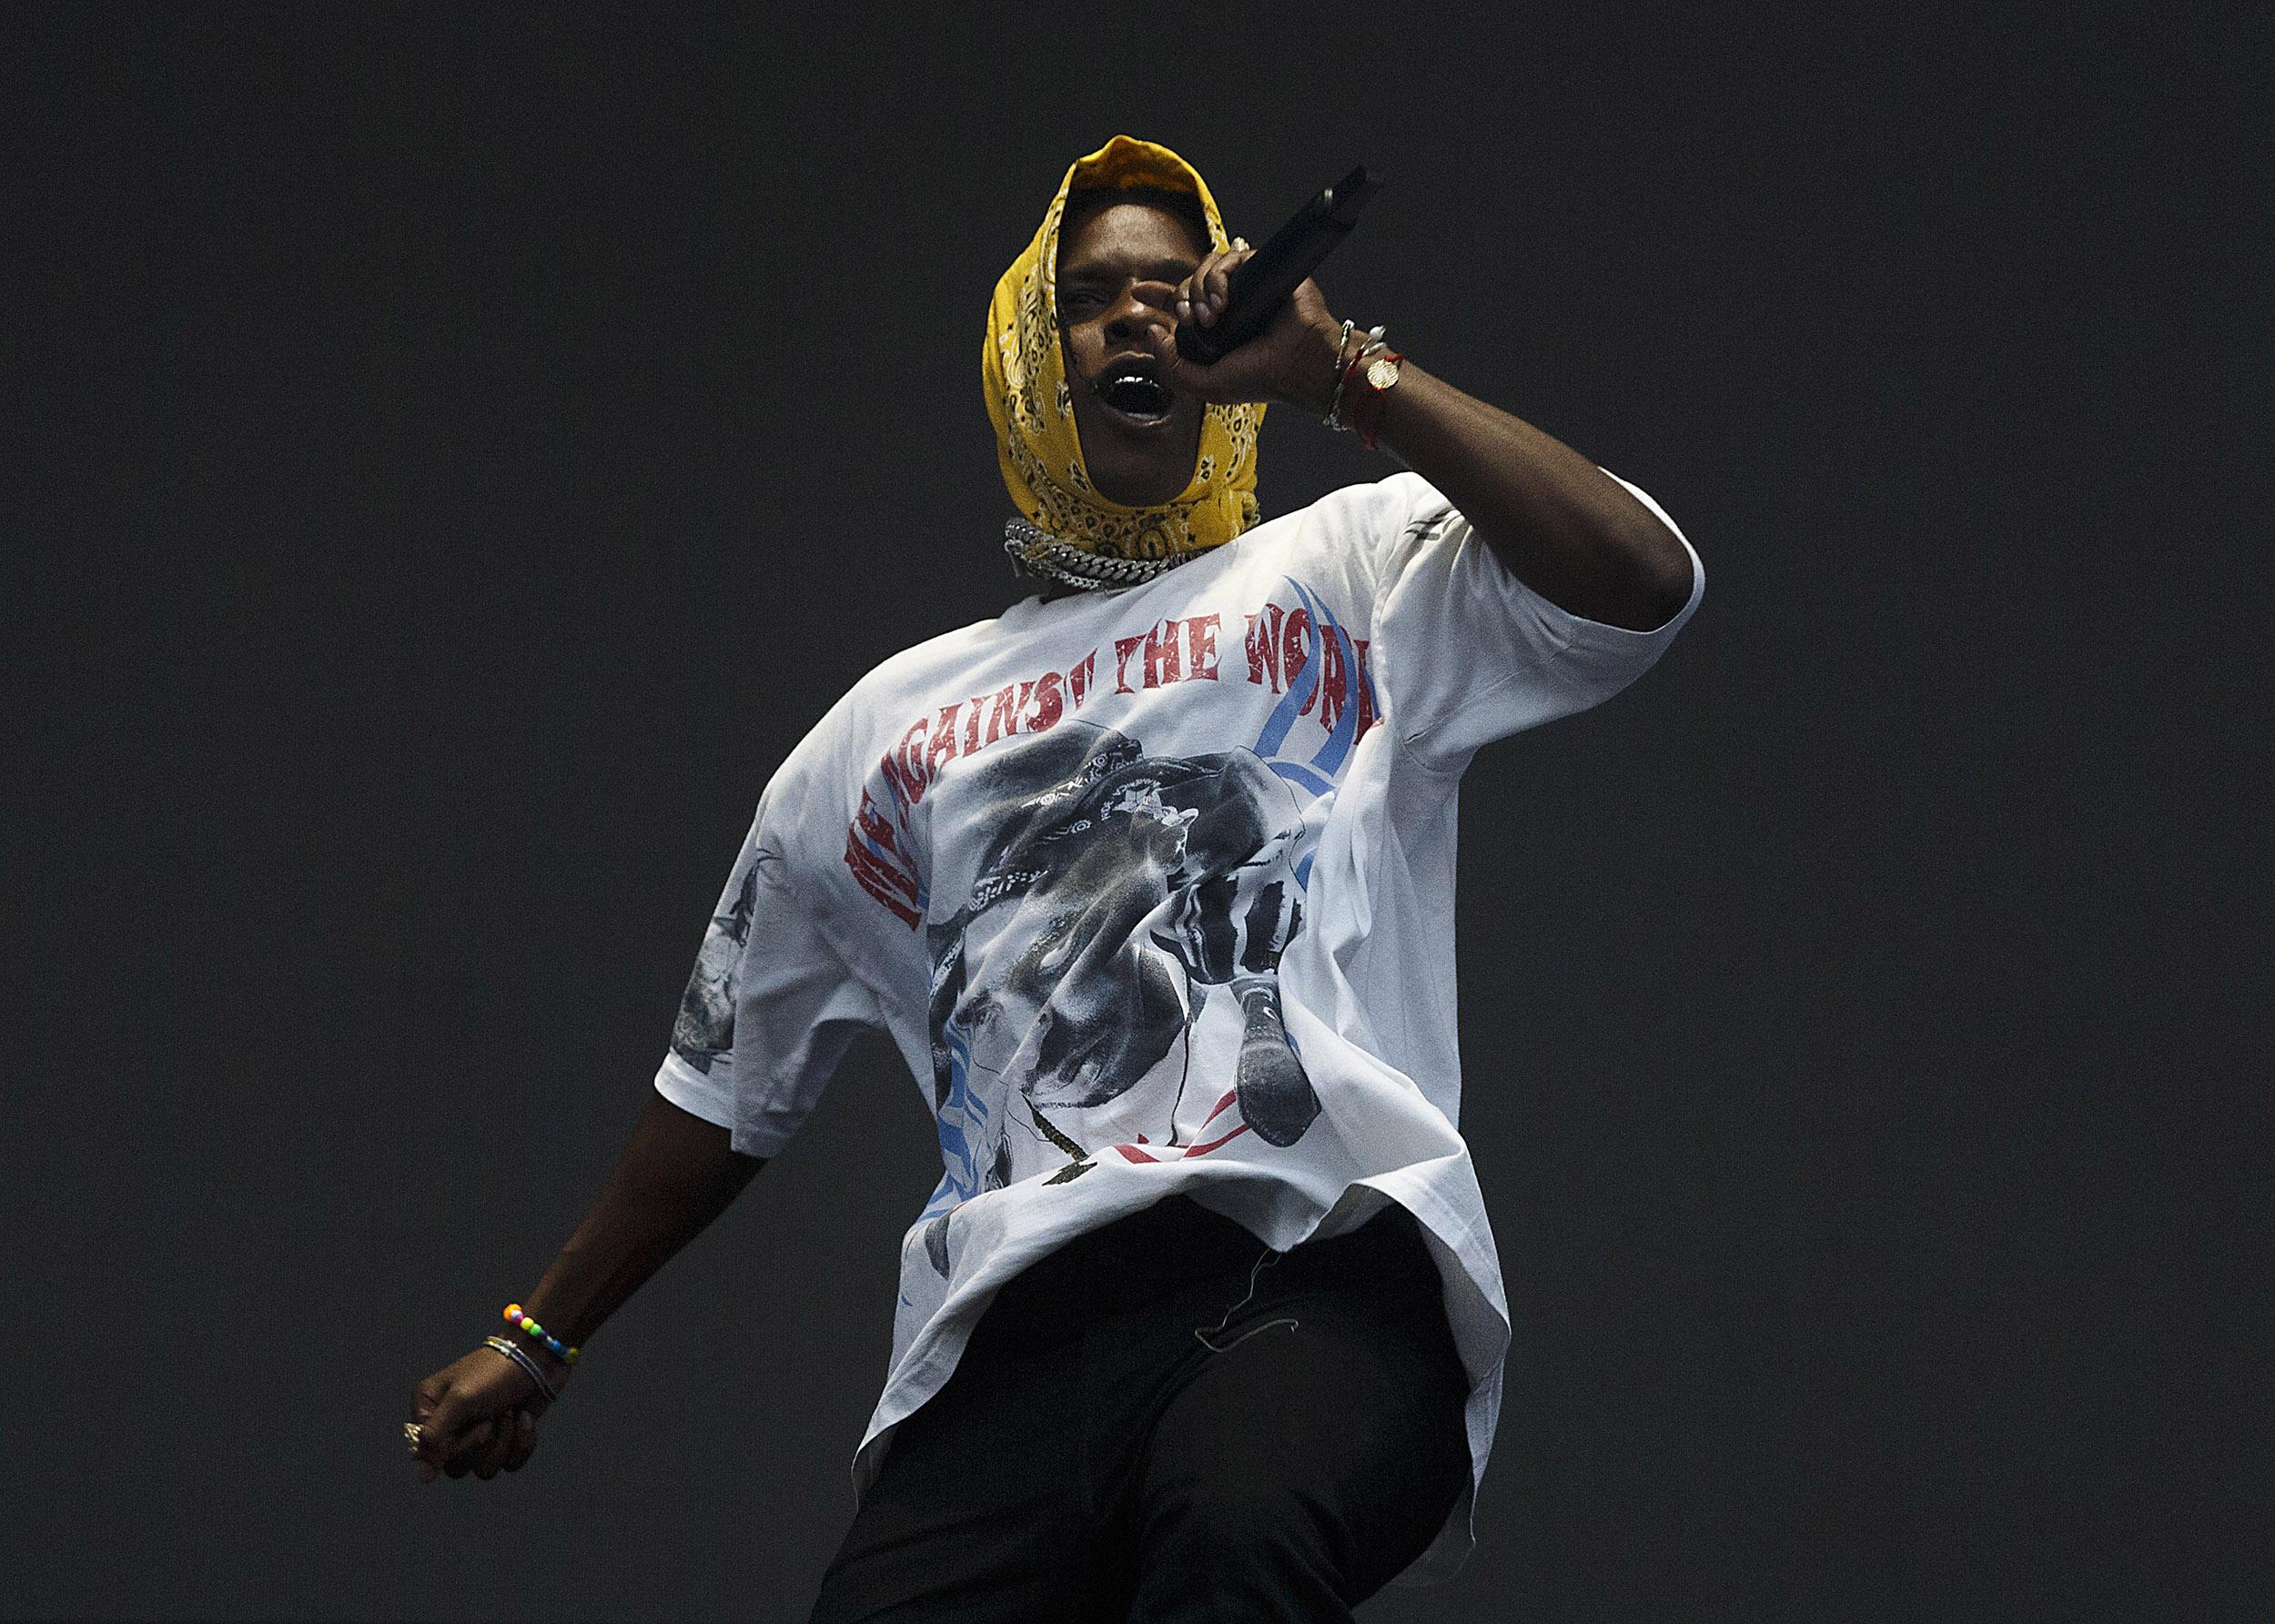 Rapper A$AP Rocky arrested on suspicion of assault in Sweden